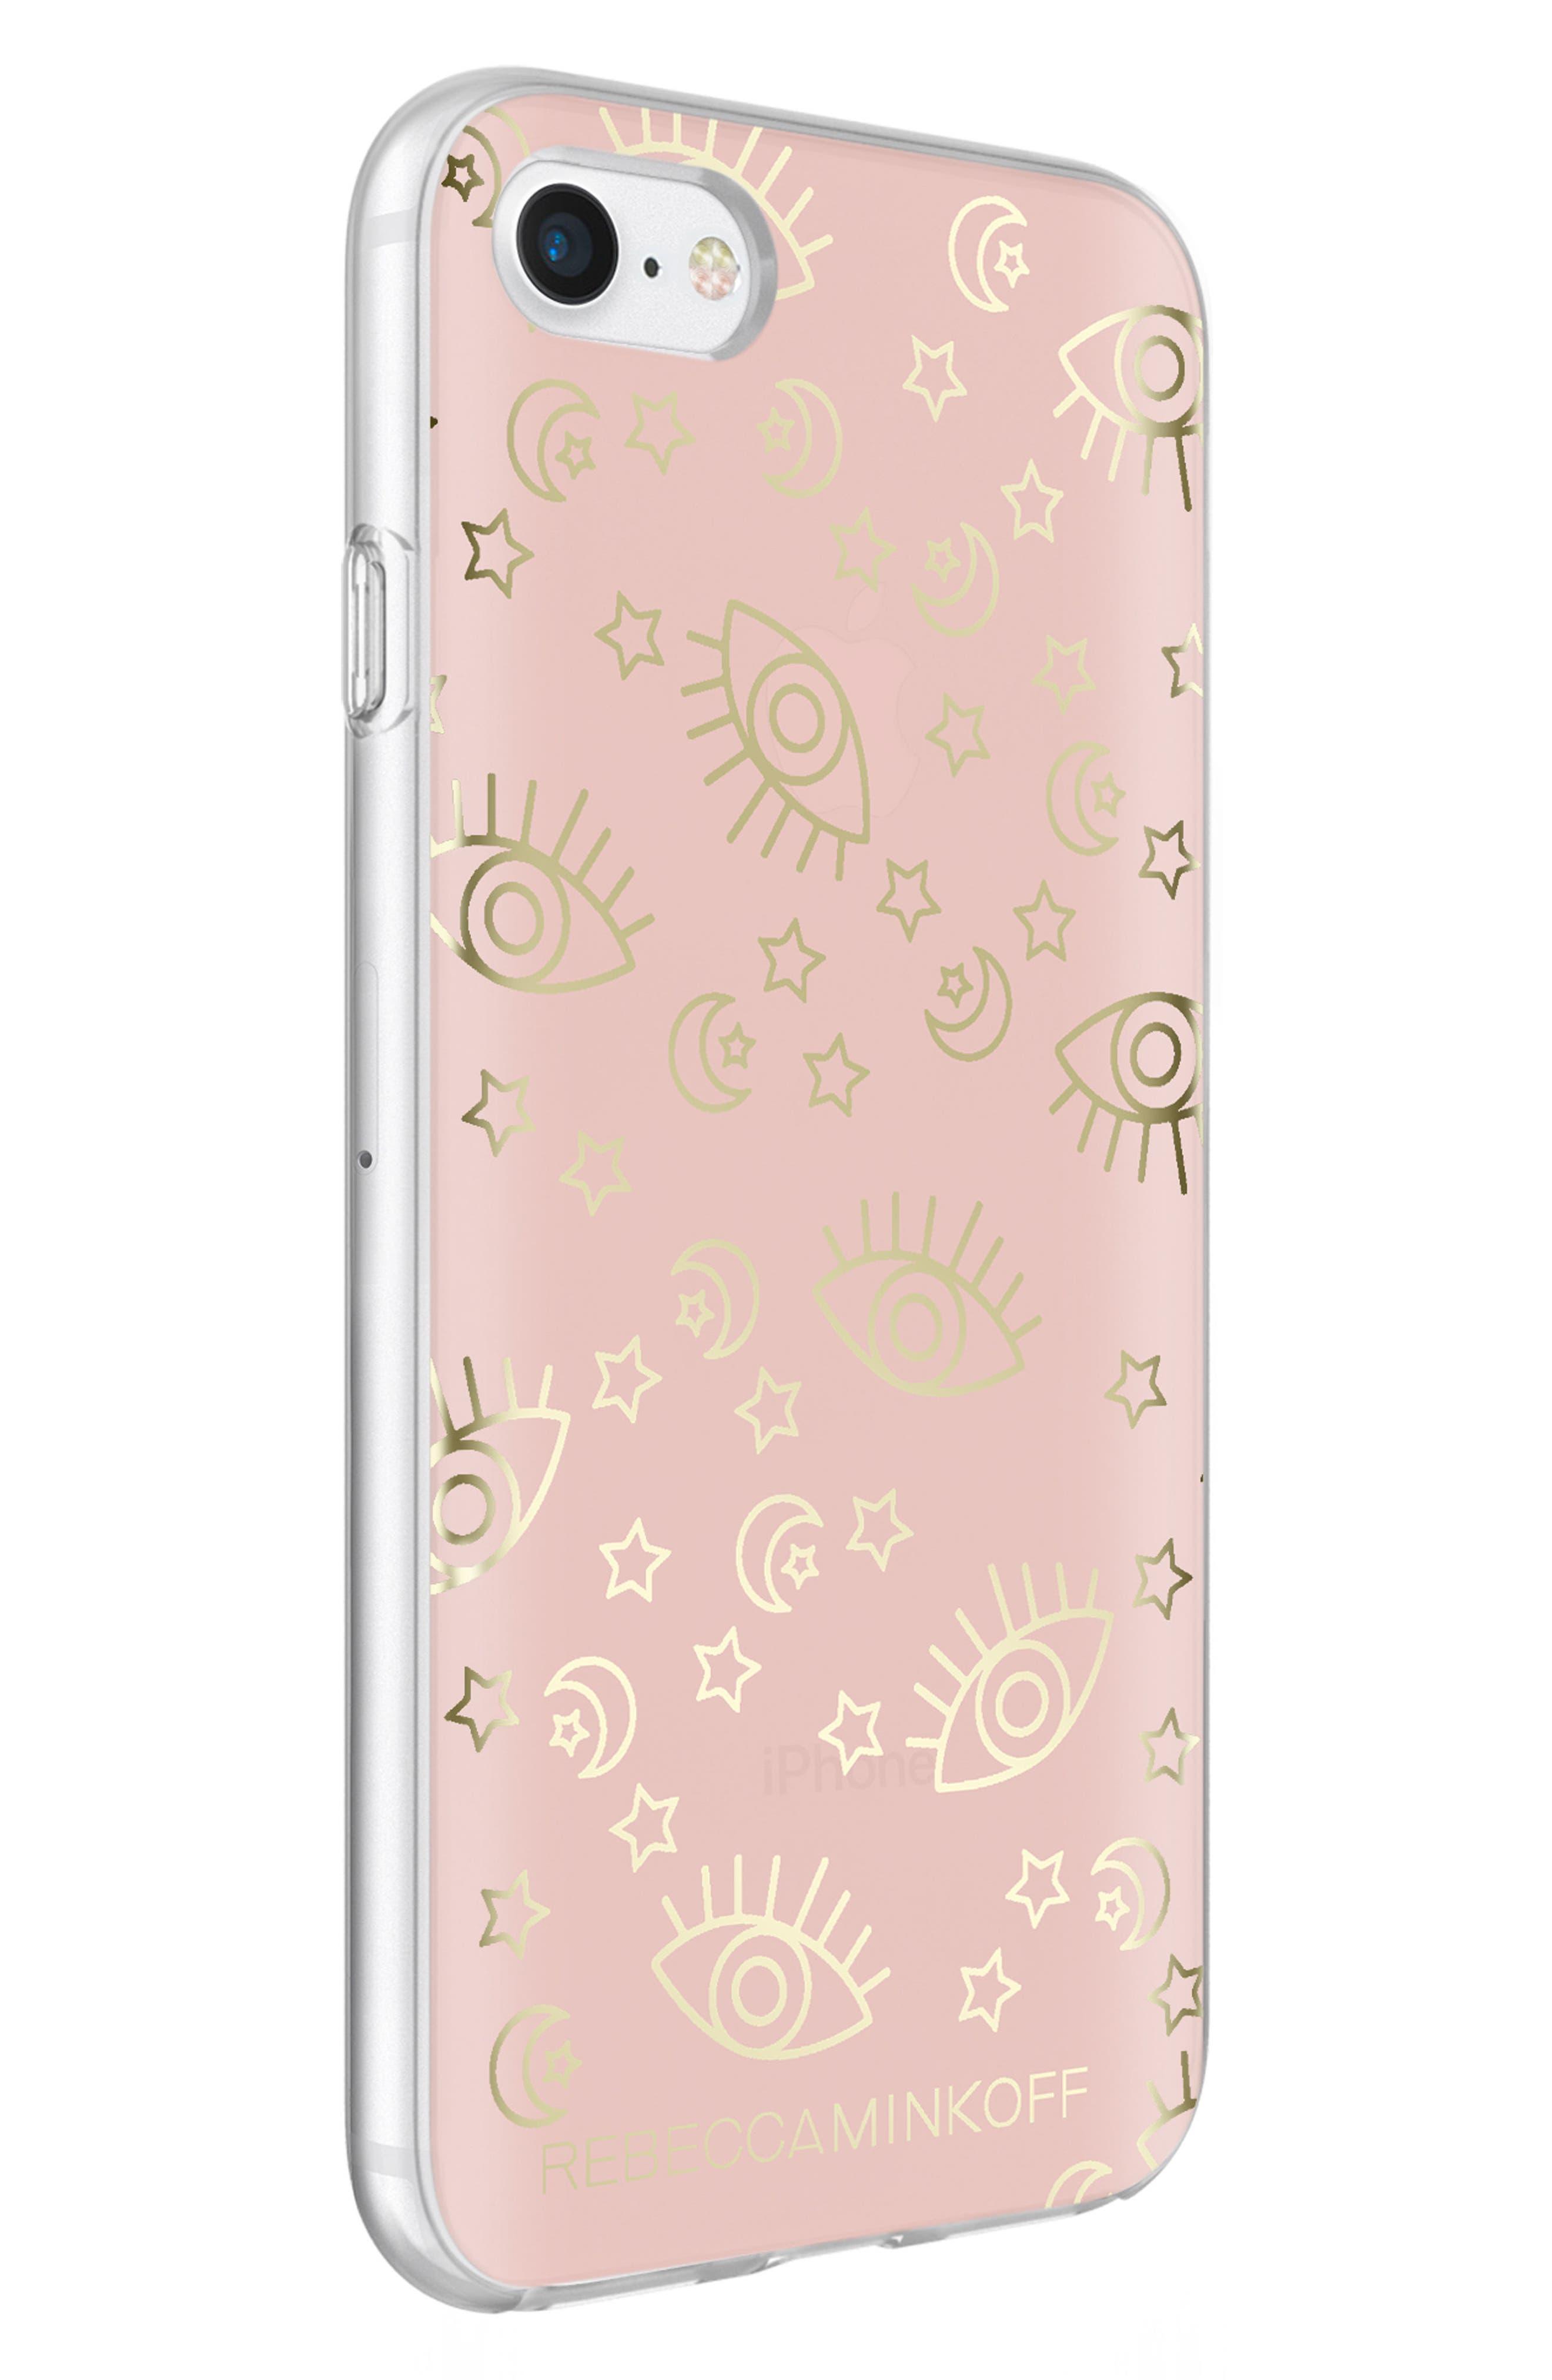 Metallic Galaxy Icon iPhone 7/8 & 7/8 Plus Case,                             Alternate thumbnail 2, color,                             Rose Gold/ Gold Foil